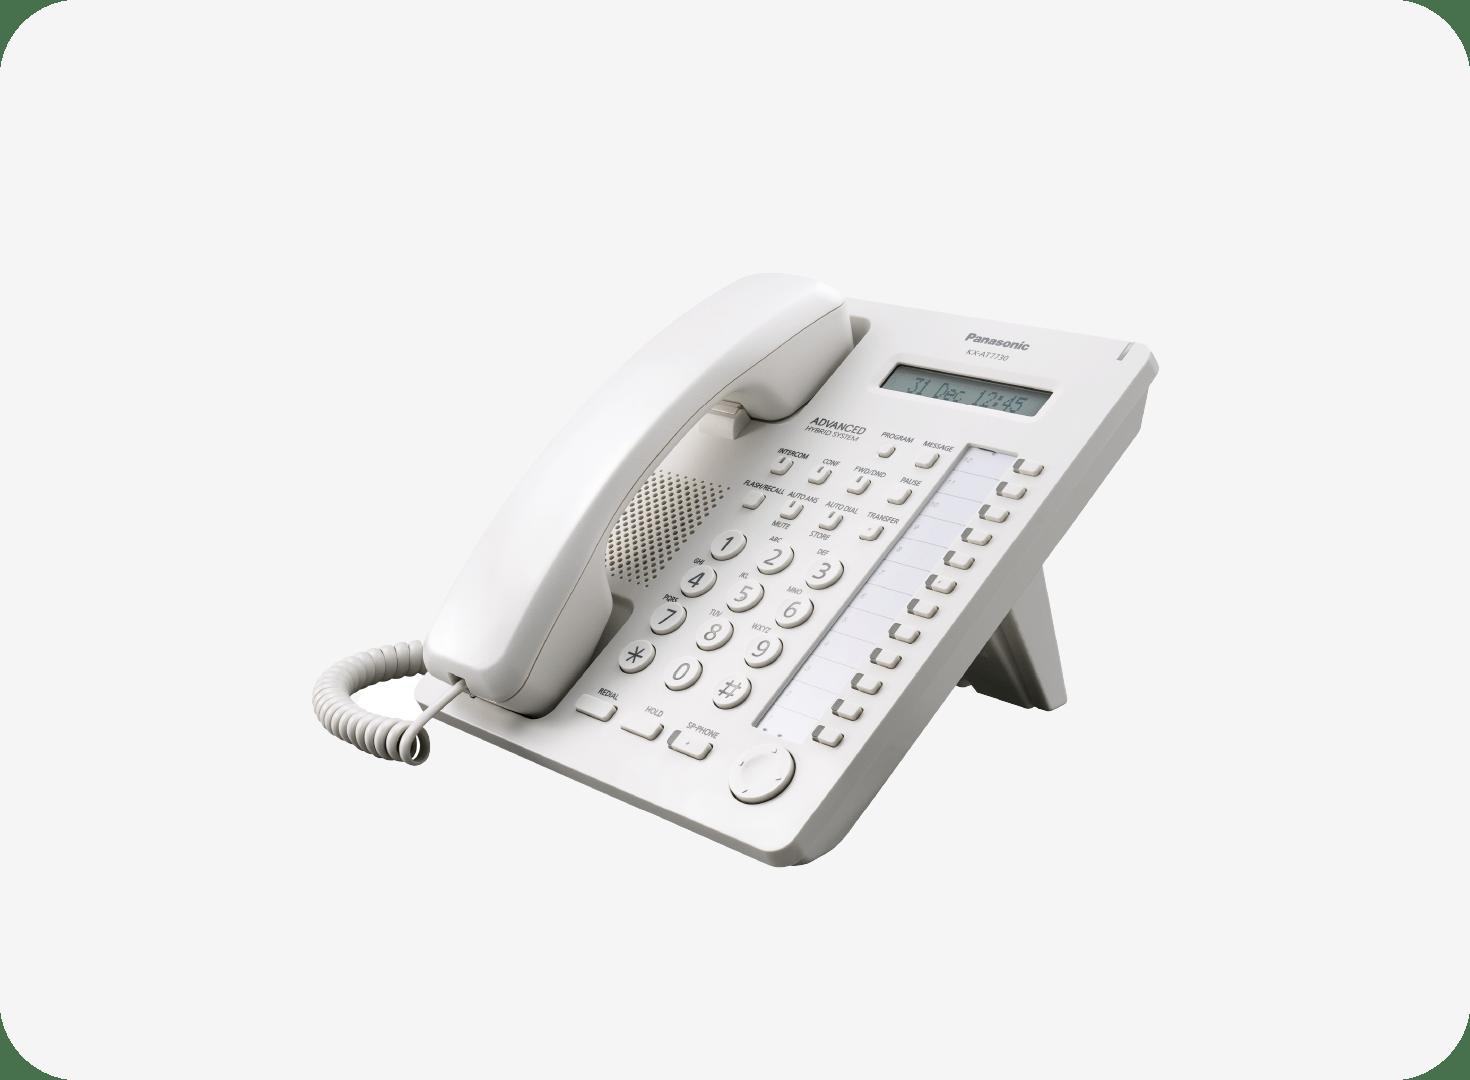 Panasonic KX AT7730 Standard Proprietary Phone